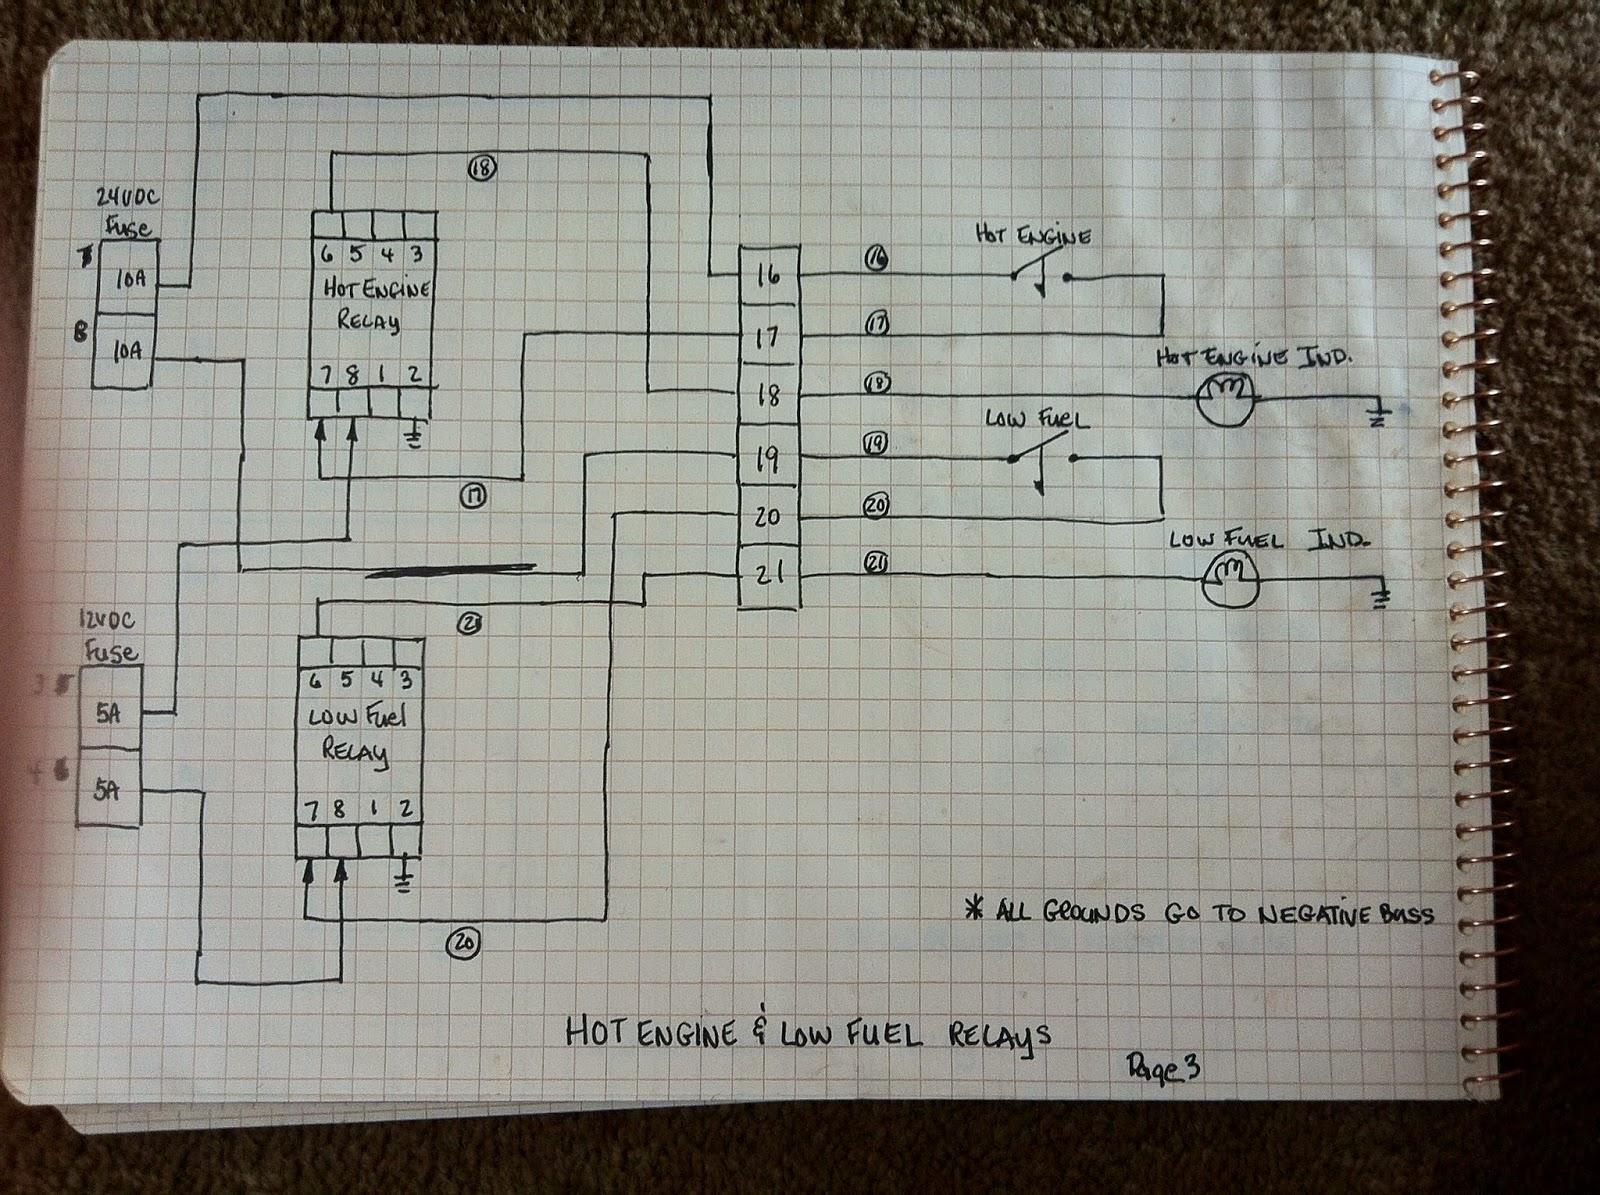 prevost wiring diagrams prevost bus wiring diagrams wiring diagram rh hg4 co Automotive Wiring Schematics Automotive Wiring Schematics